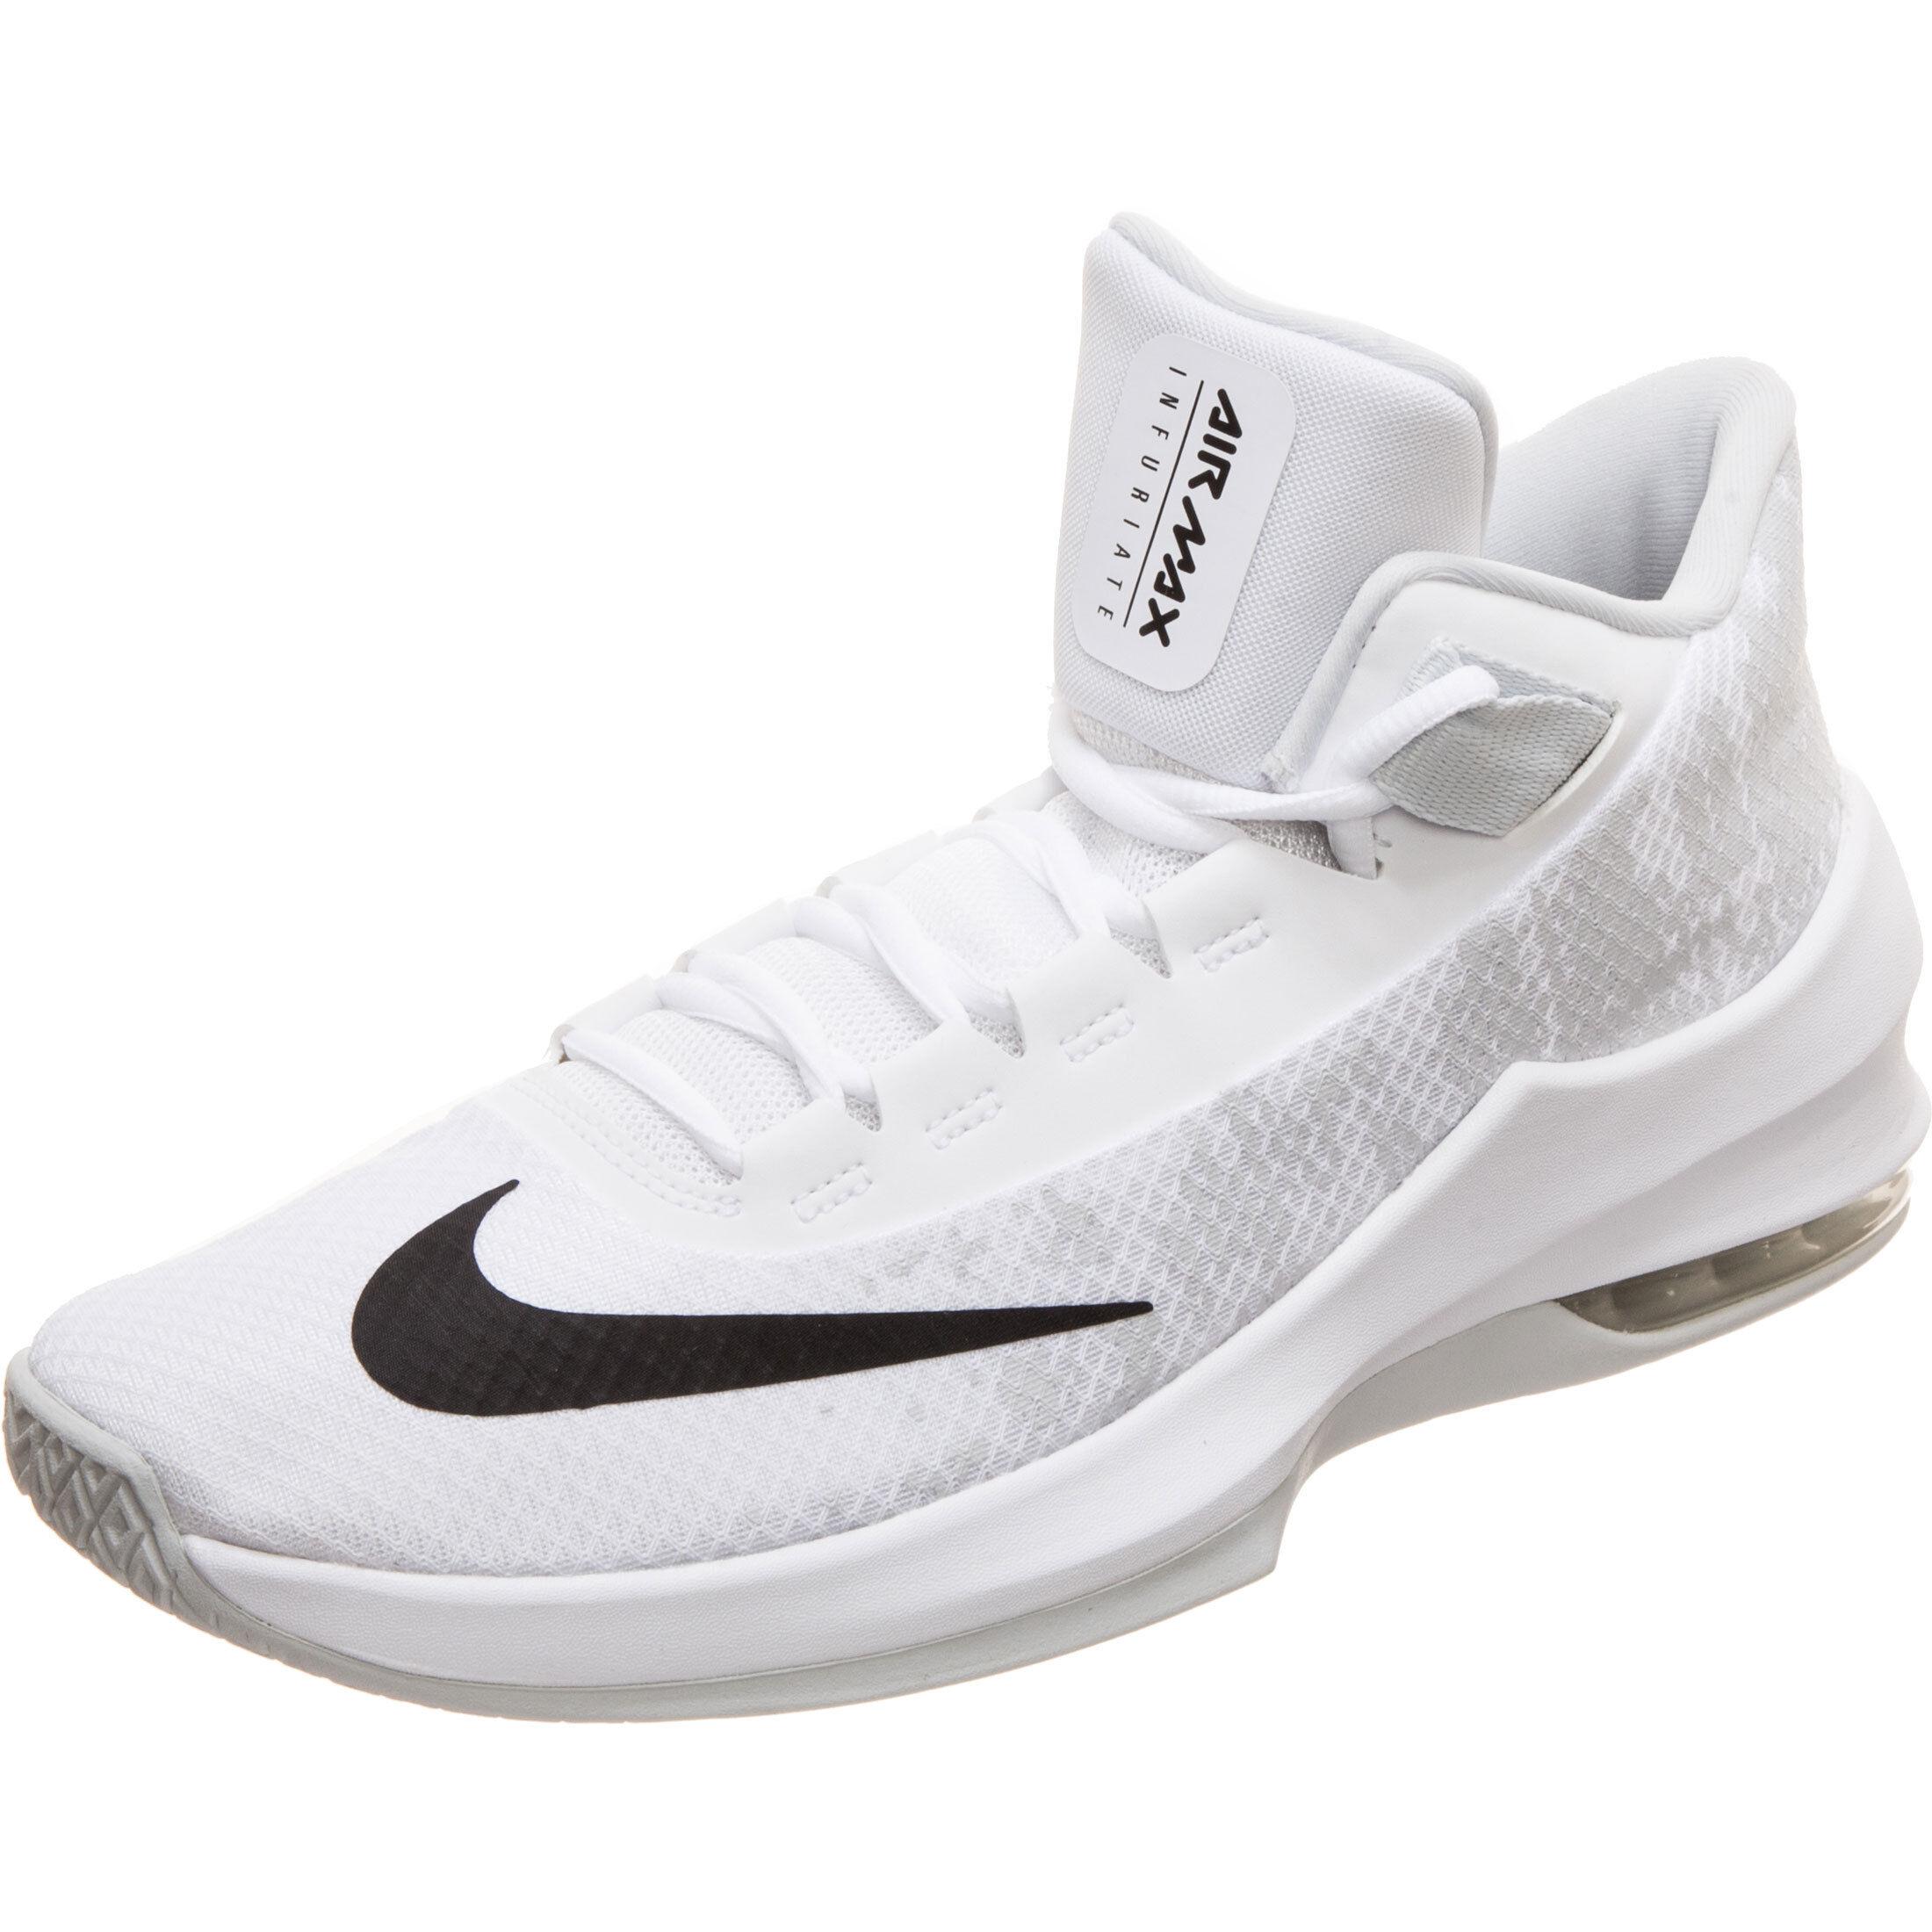 Kaufen Mädchen Nike Air Max Infuriate Basketballschuh Kinder